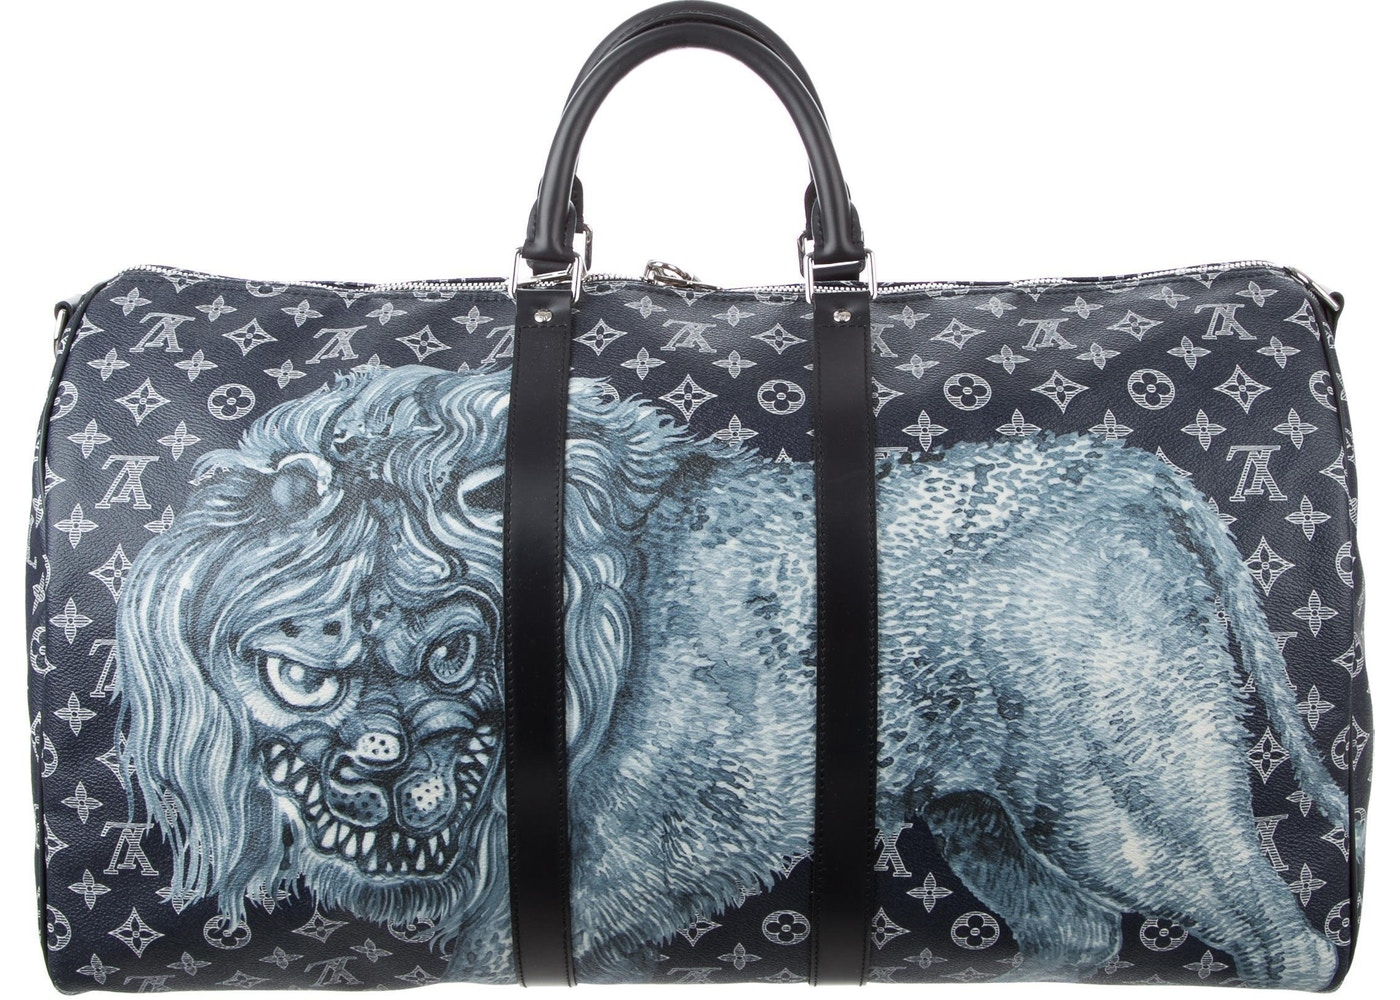 2587919dd3e9 Louis Vuitton Duffle Keepall Bandouliere Savane Monogram ...